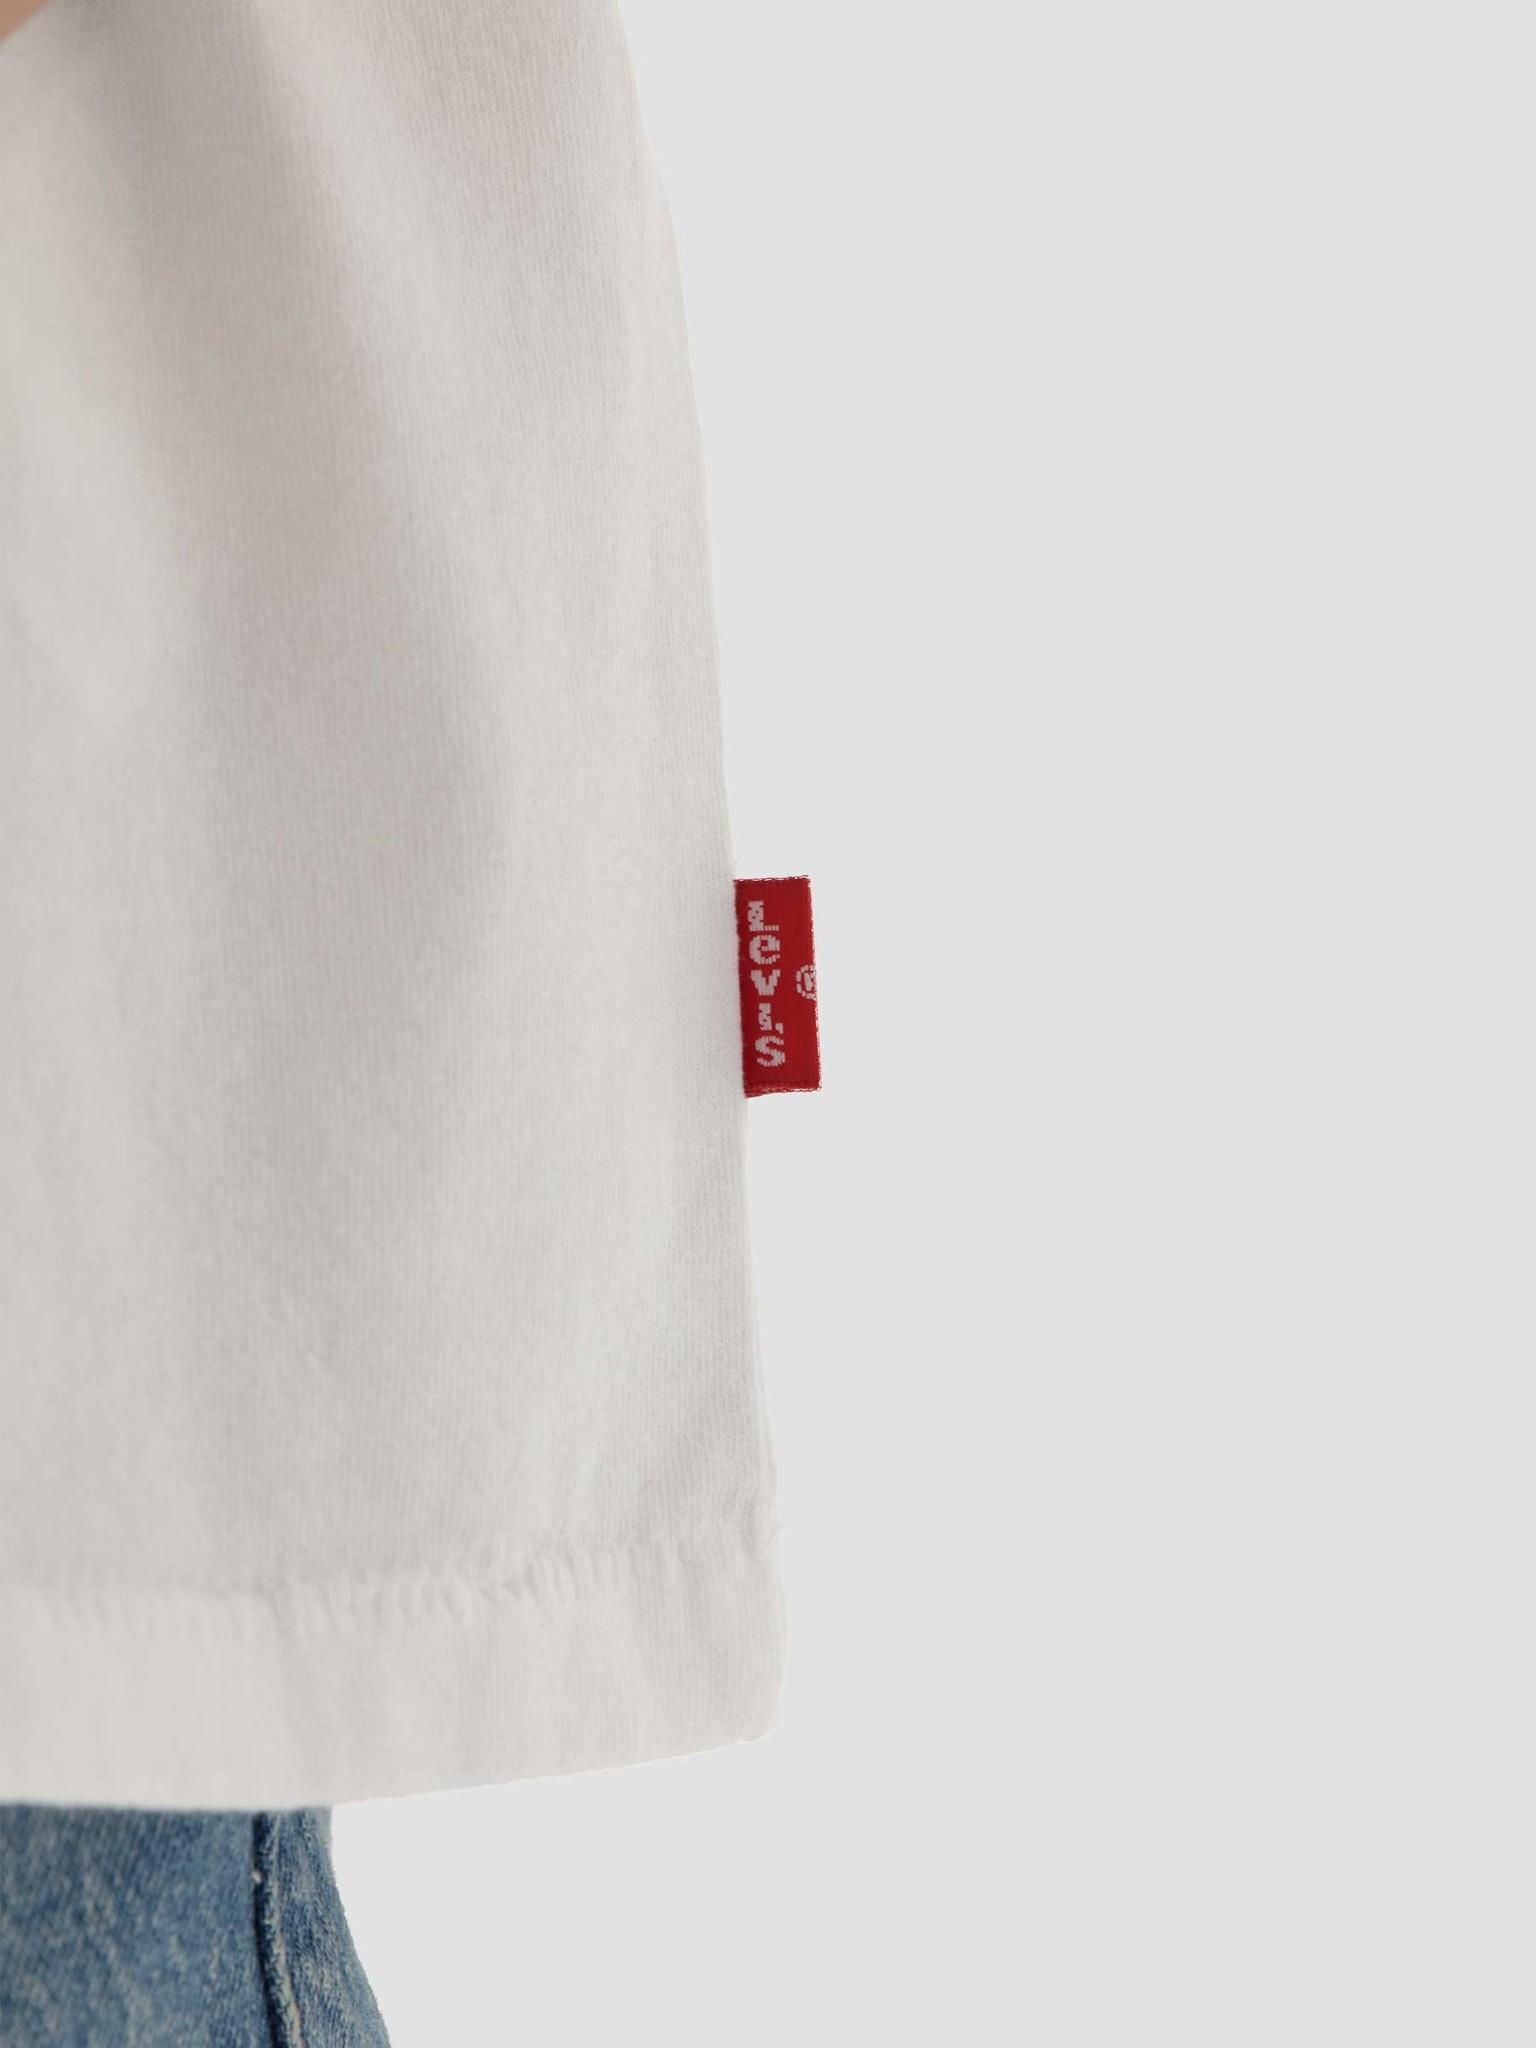 Levis Levis Red Tab Vintage T-Shirt White  Neutrals A0637-0000